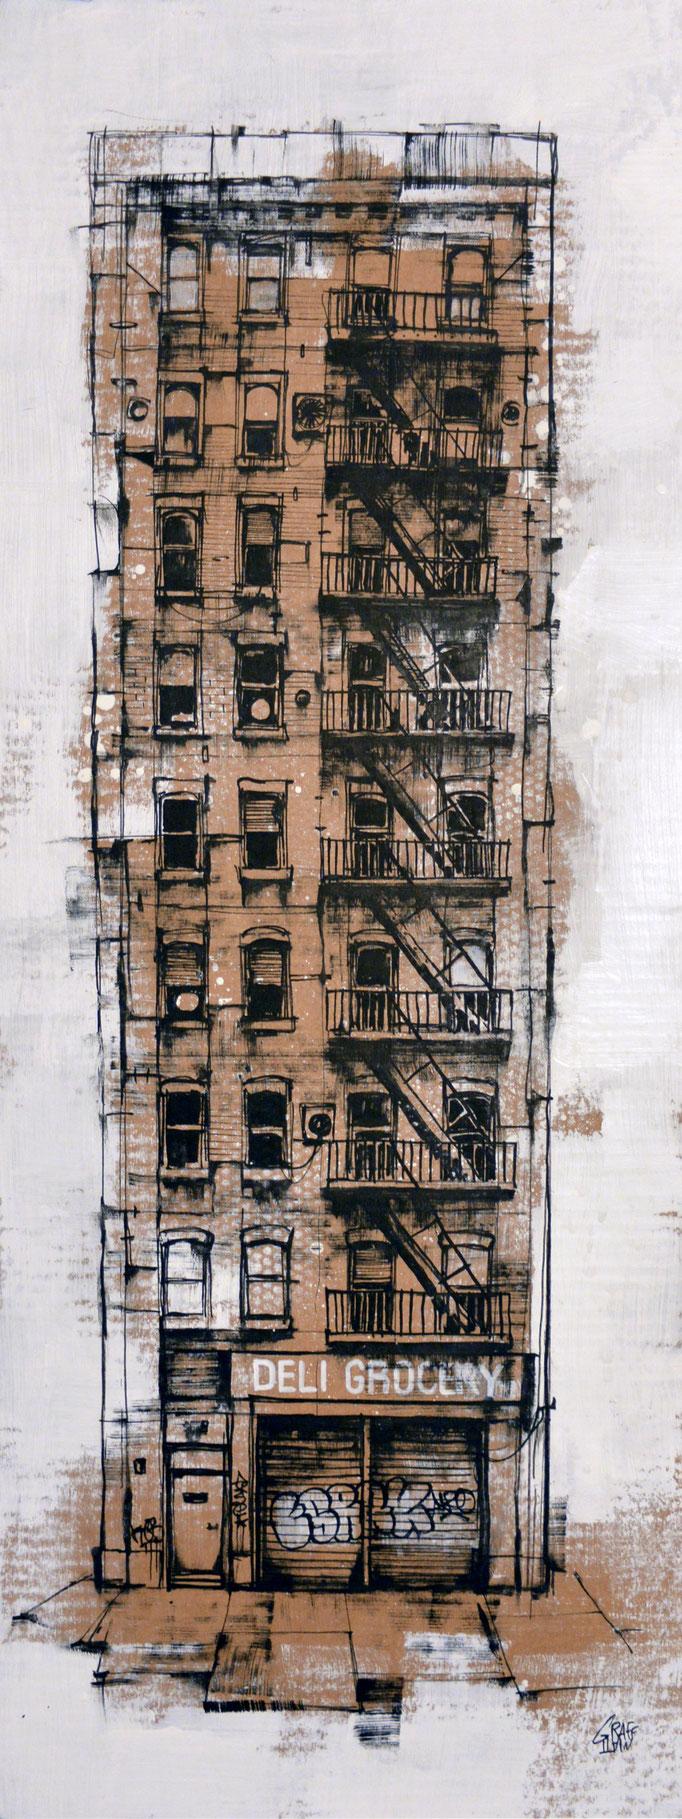 "<b>DELI GROCERY</b><br>80 x 30 cm<br><a style=""color:#db6464;"">Vendu</br></a> <alt=""art peinture ville newyork facade urbaine immeuble new-york city dessin rue urban art urban scene"">"